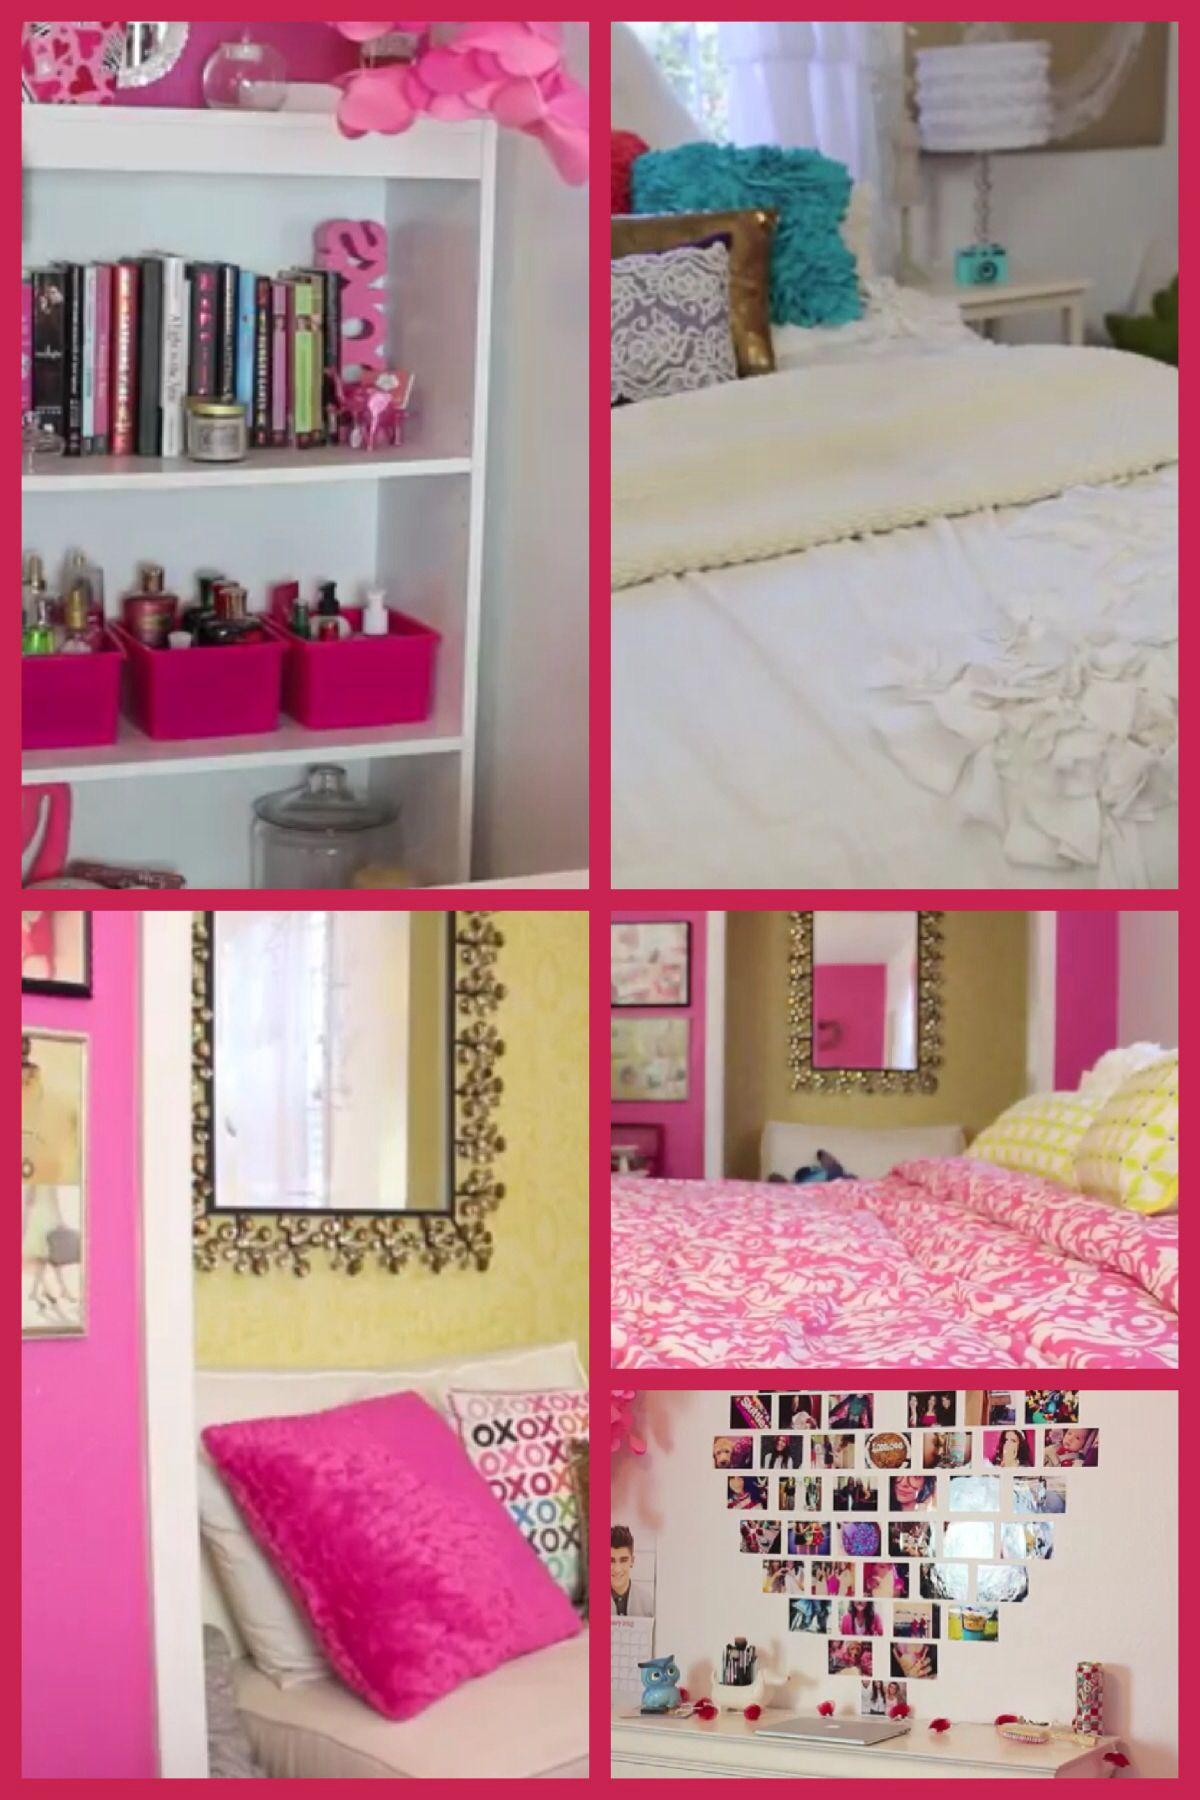 Bethany Mota\'s Room is Amazing | SUNNY ROOM INSPO | Pinterest